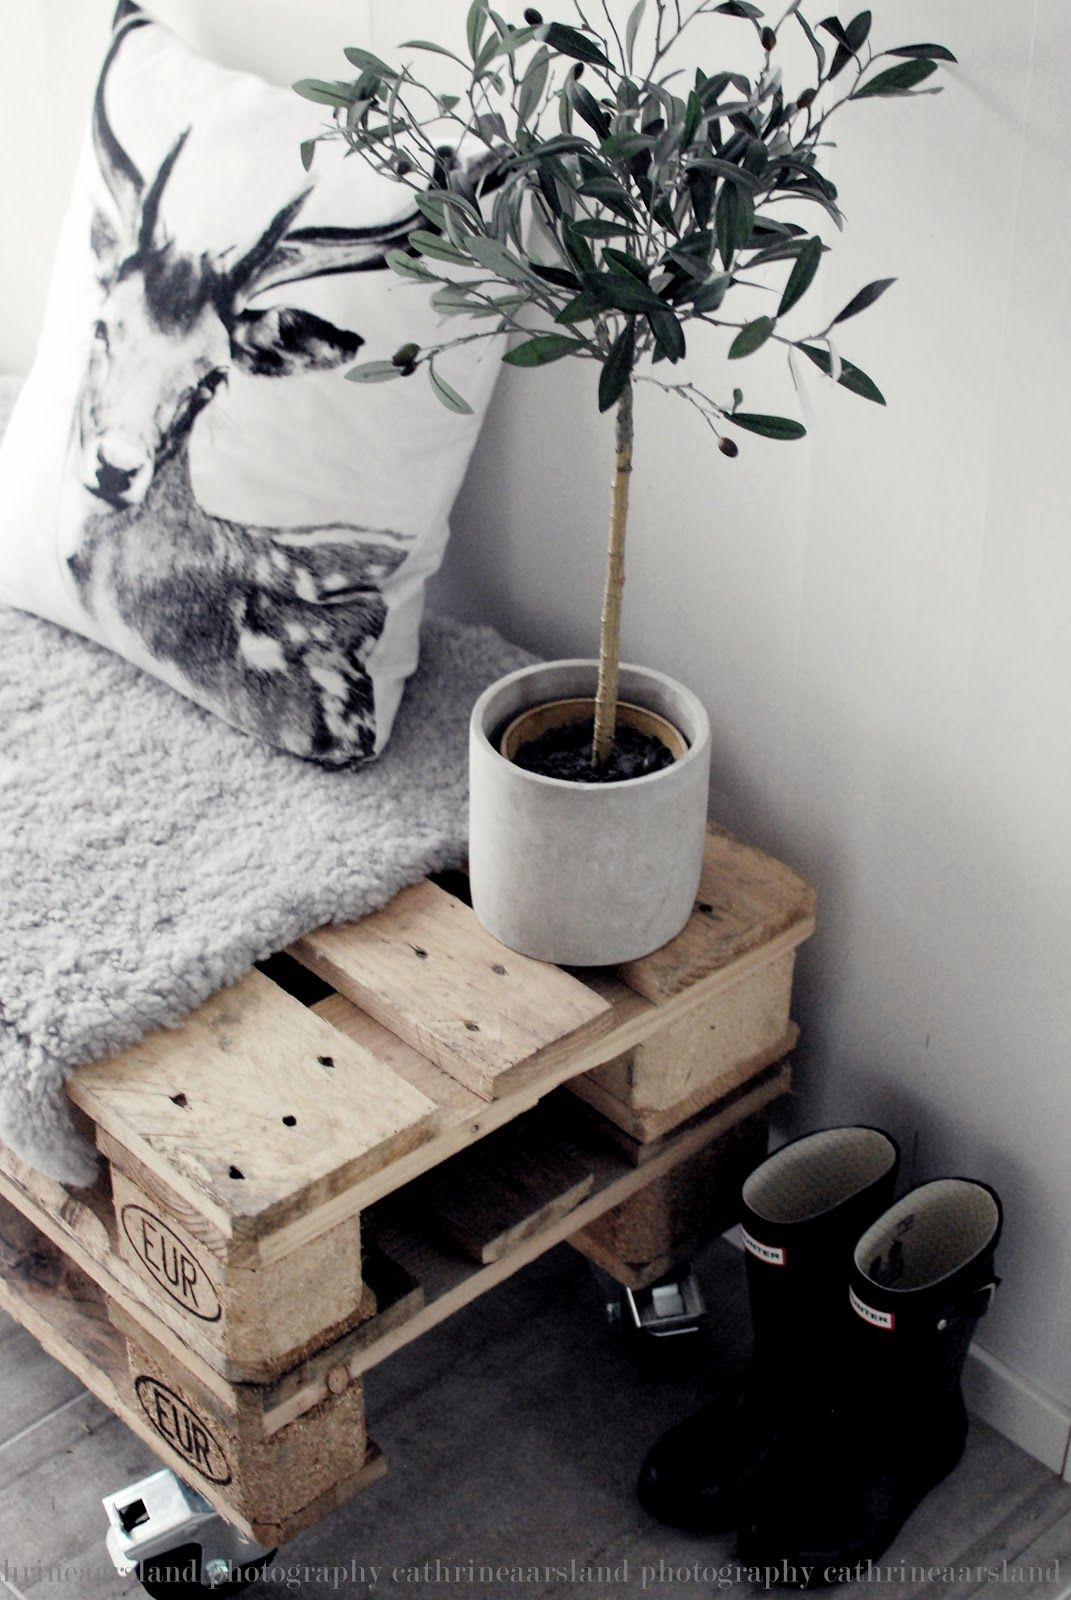 recicla y decora con palets: 29 ideas imperdibles | europalette